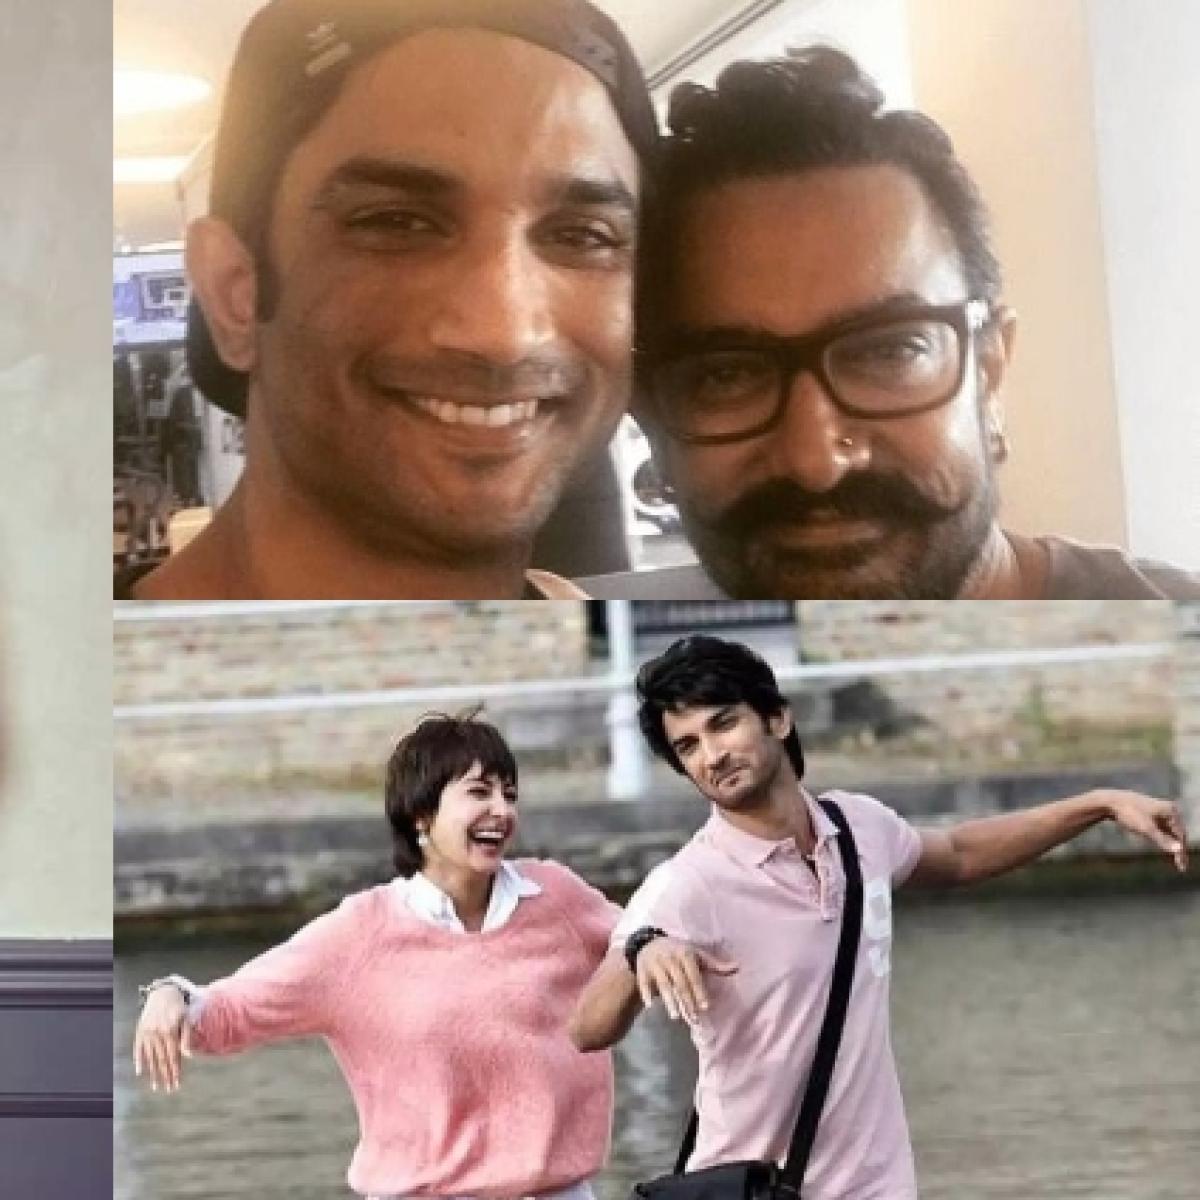 Kangana Ranaut questions Aamir Khan, Anushka Sharma's silence over Sushant Singh Rajput's death